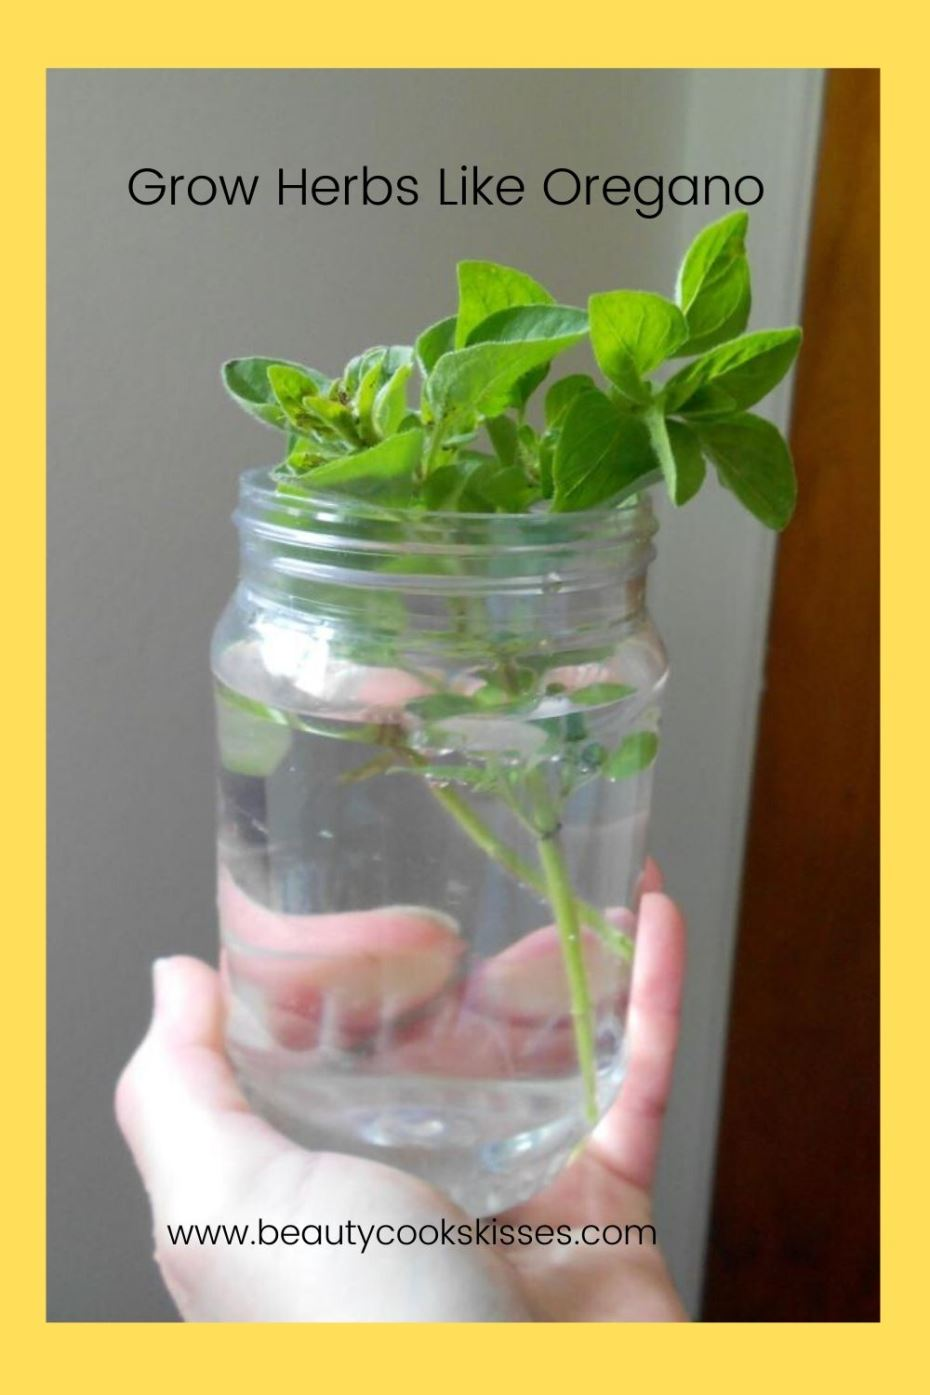 Grow Herbs Like Oregano